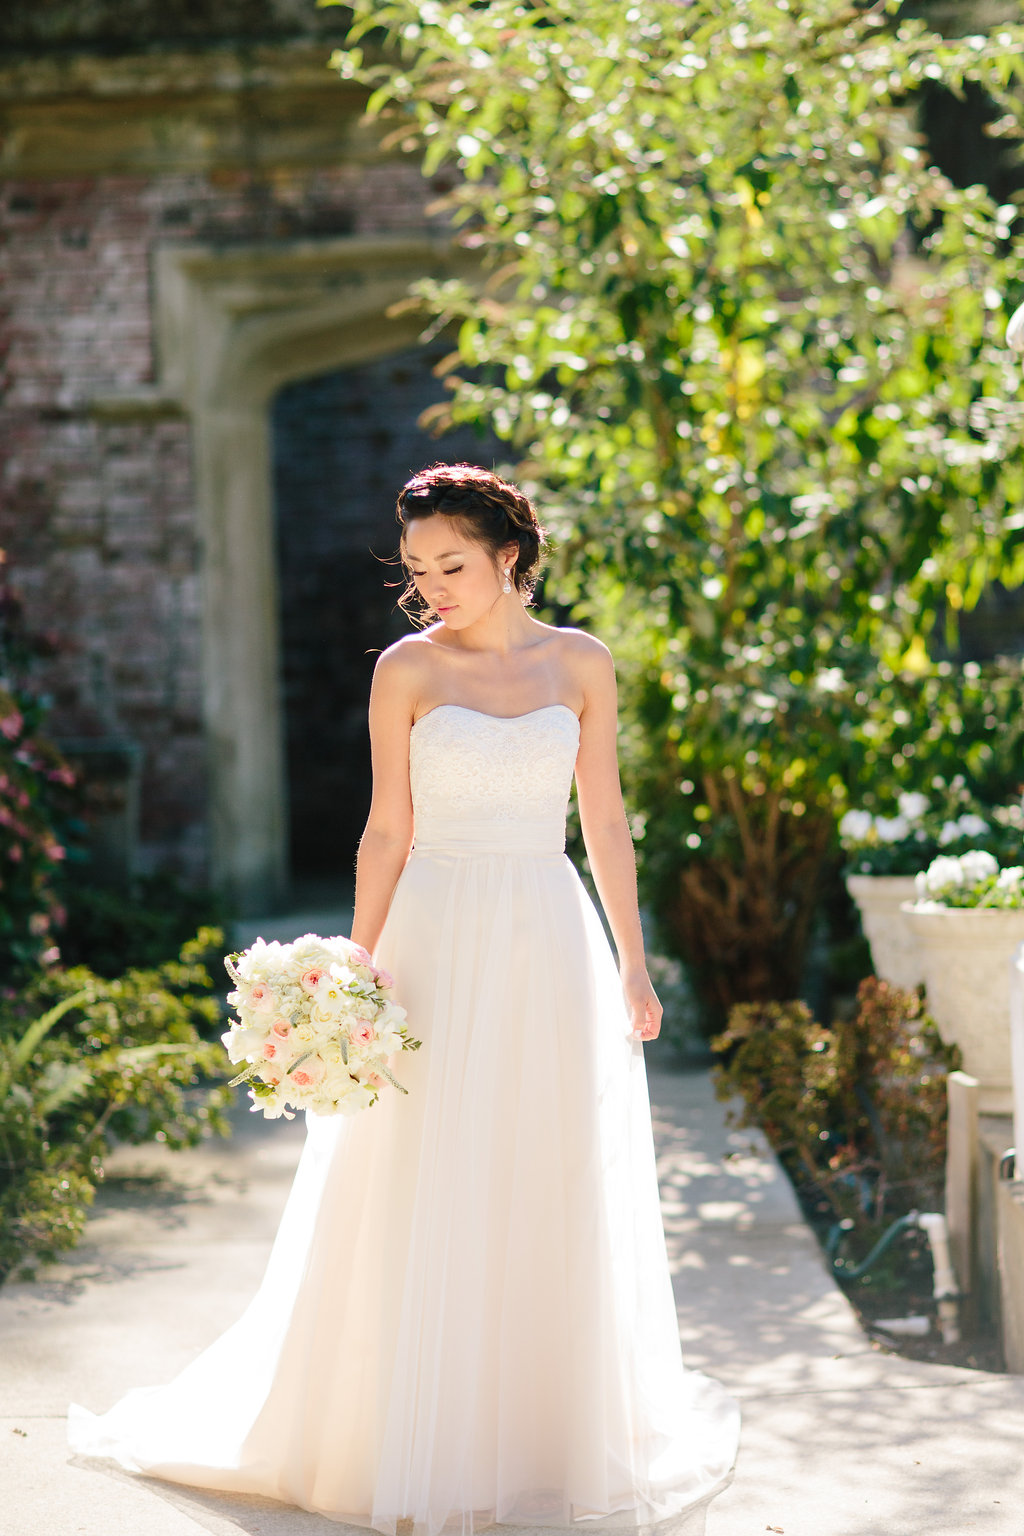 Kellylemonphotography_lucy+kento_weddingpreviews-19.jpg